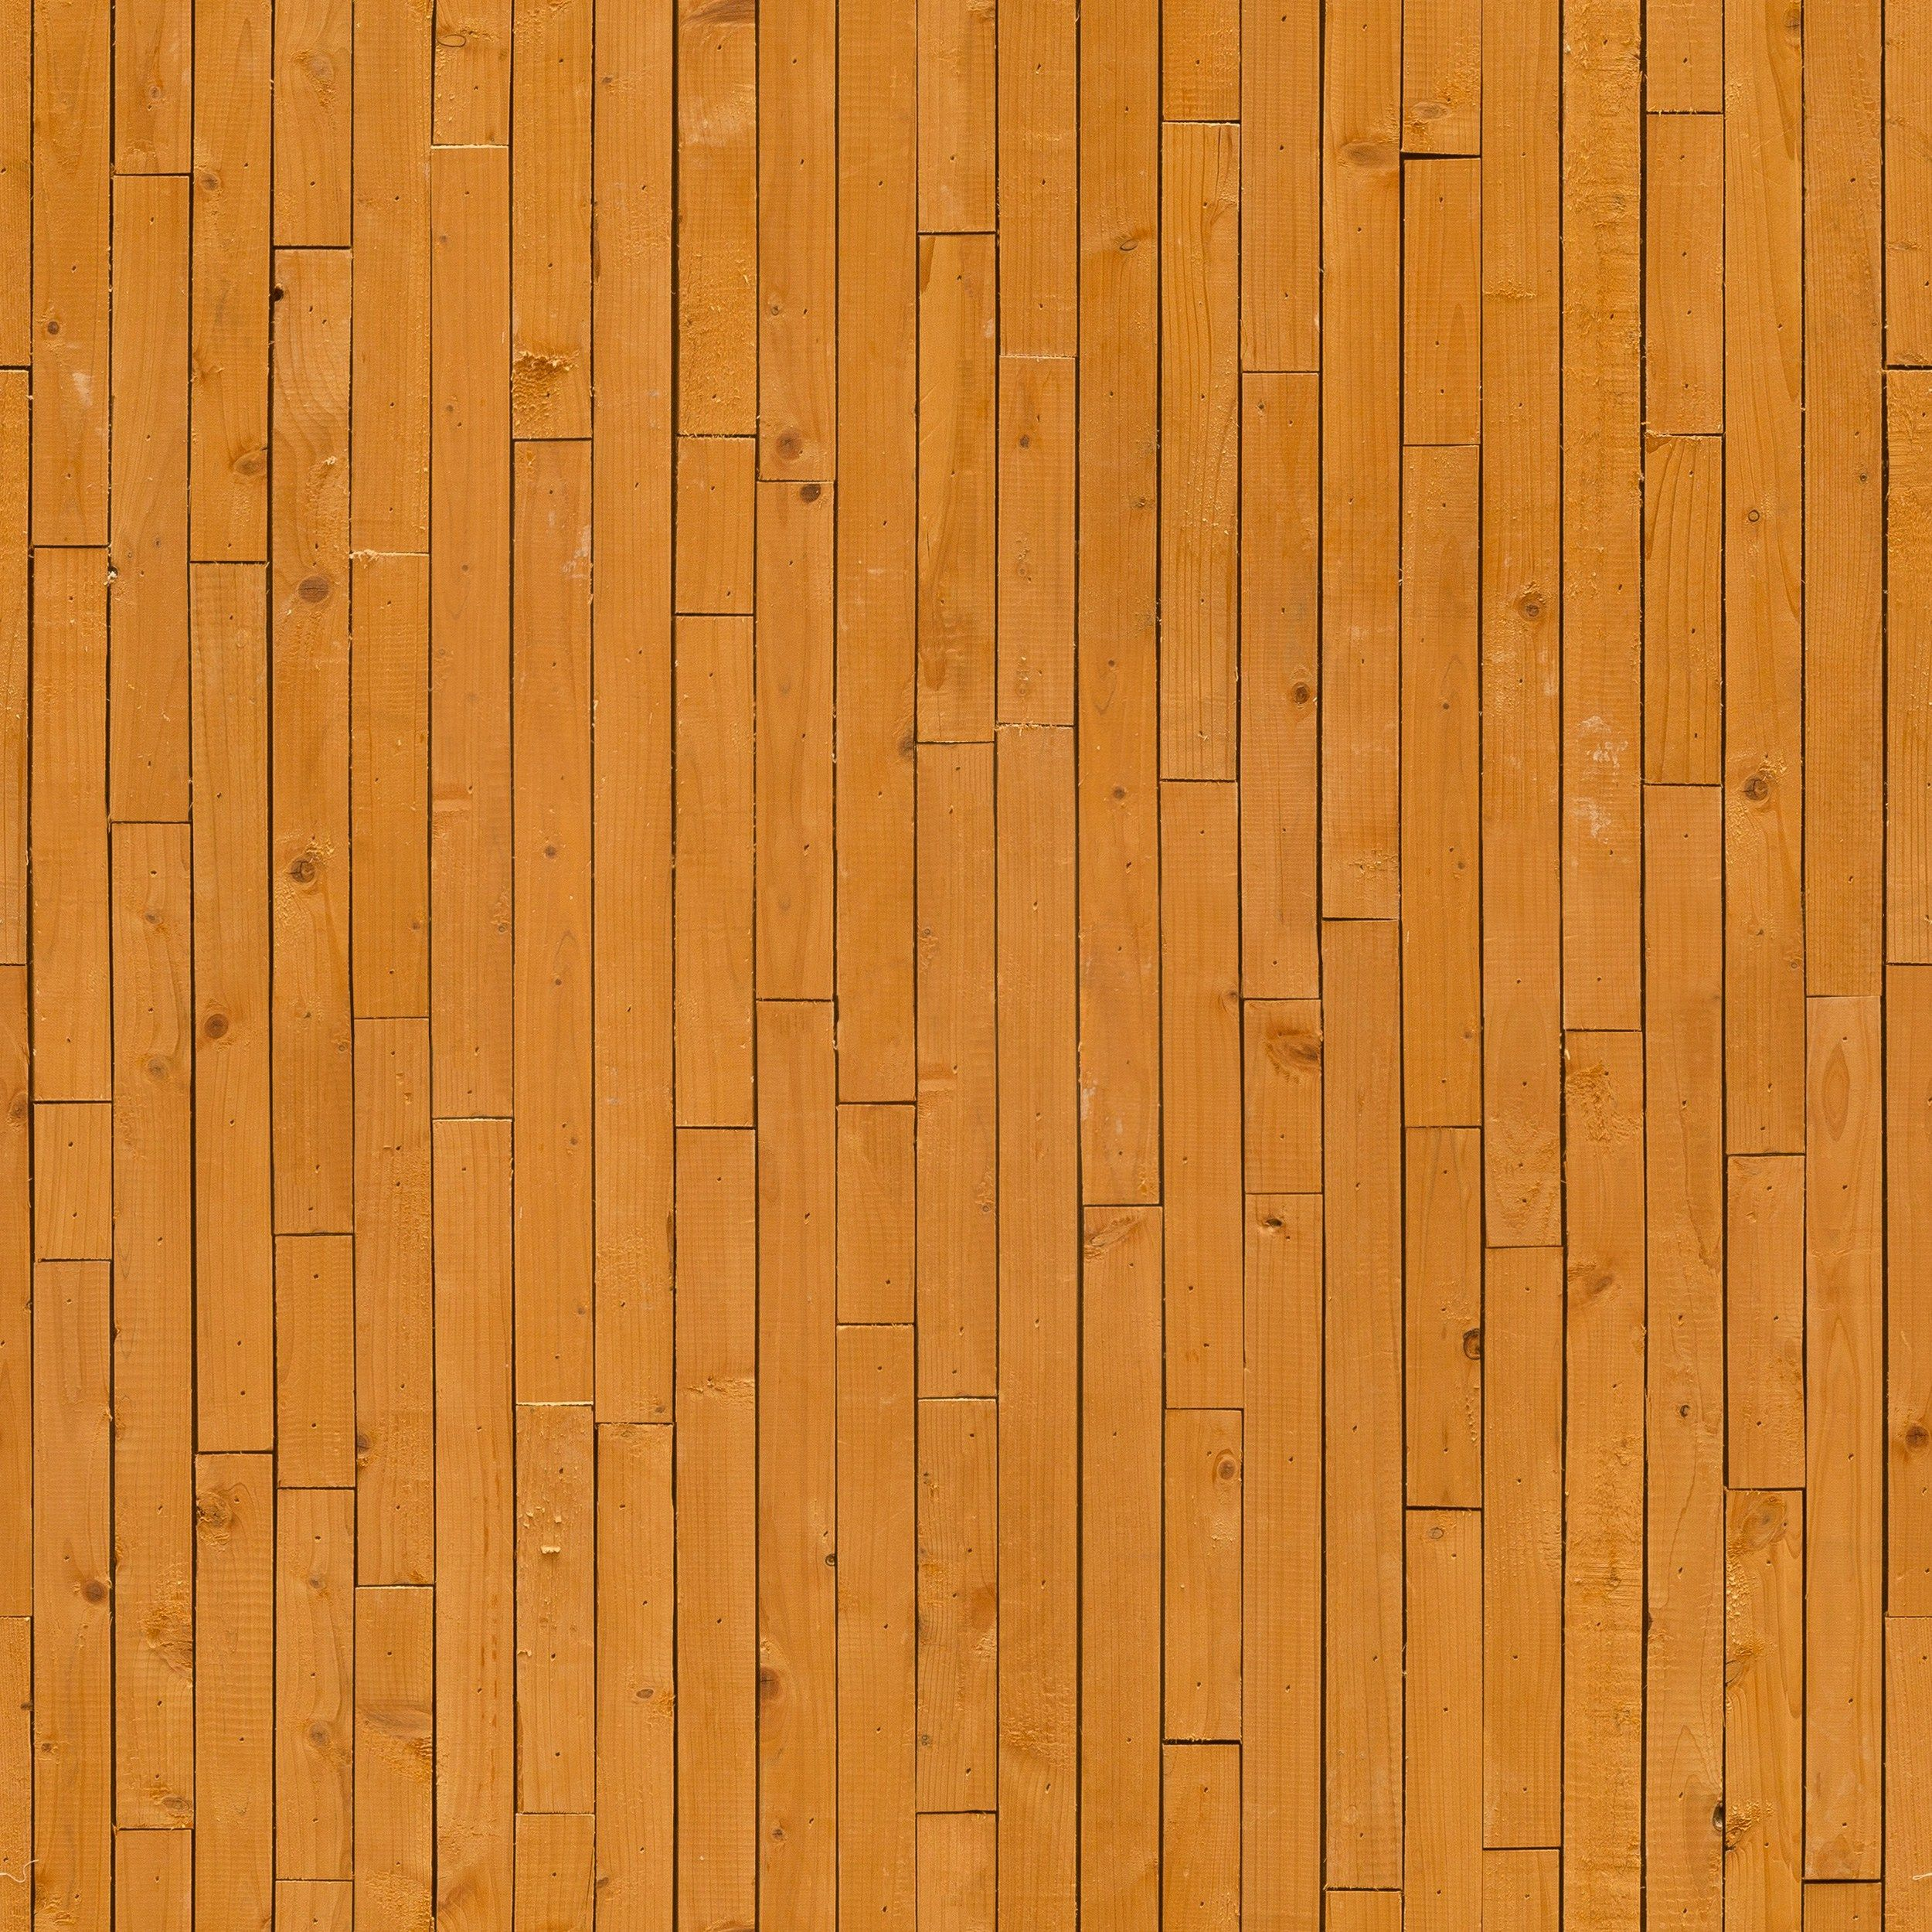 Wood plank flooring seamless texture free tiling textures wood plank flooring seamless texture dailygadgetfo Choice Image